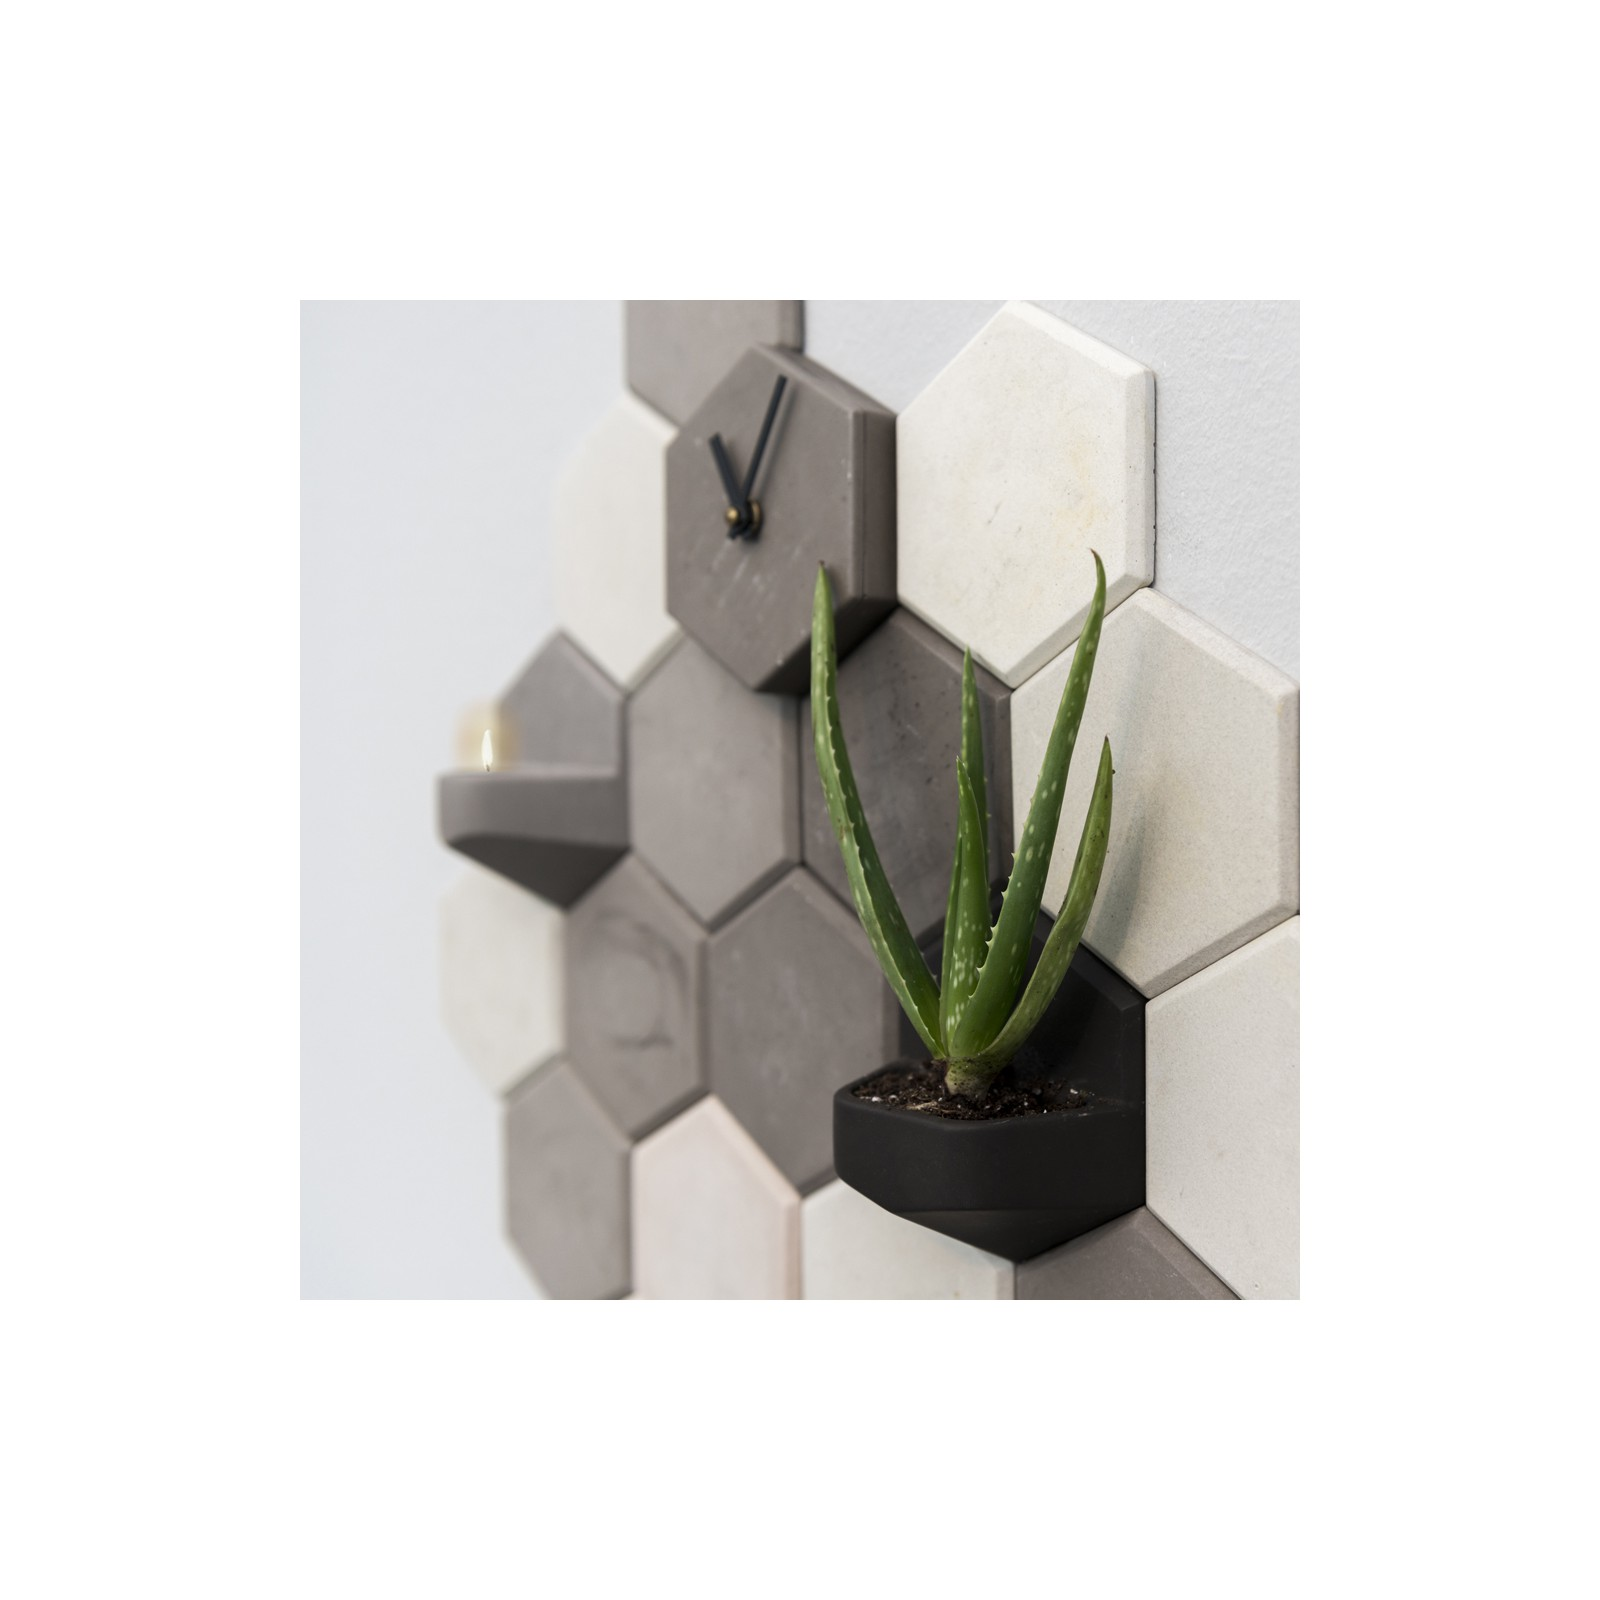 sculpture murale simul 6 arne concept. Black Bedroom Furniture Sets. Home Design Ideas